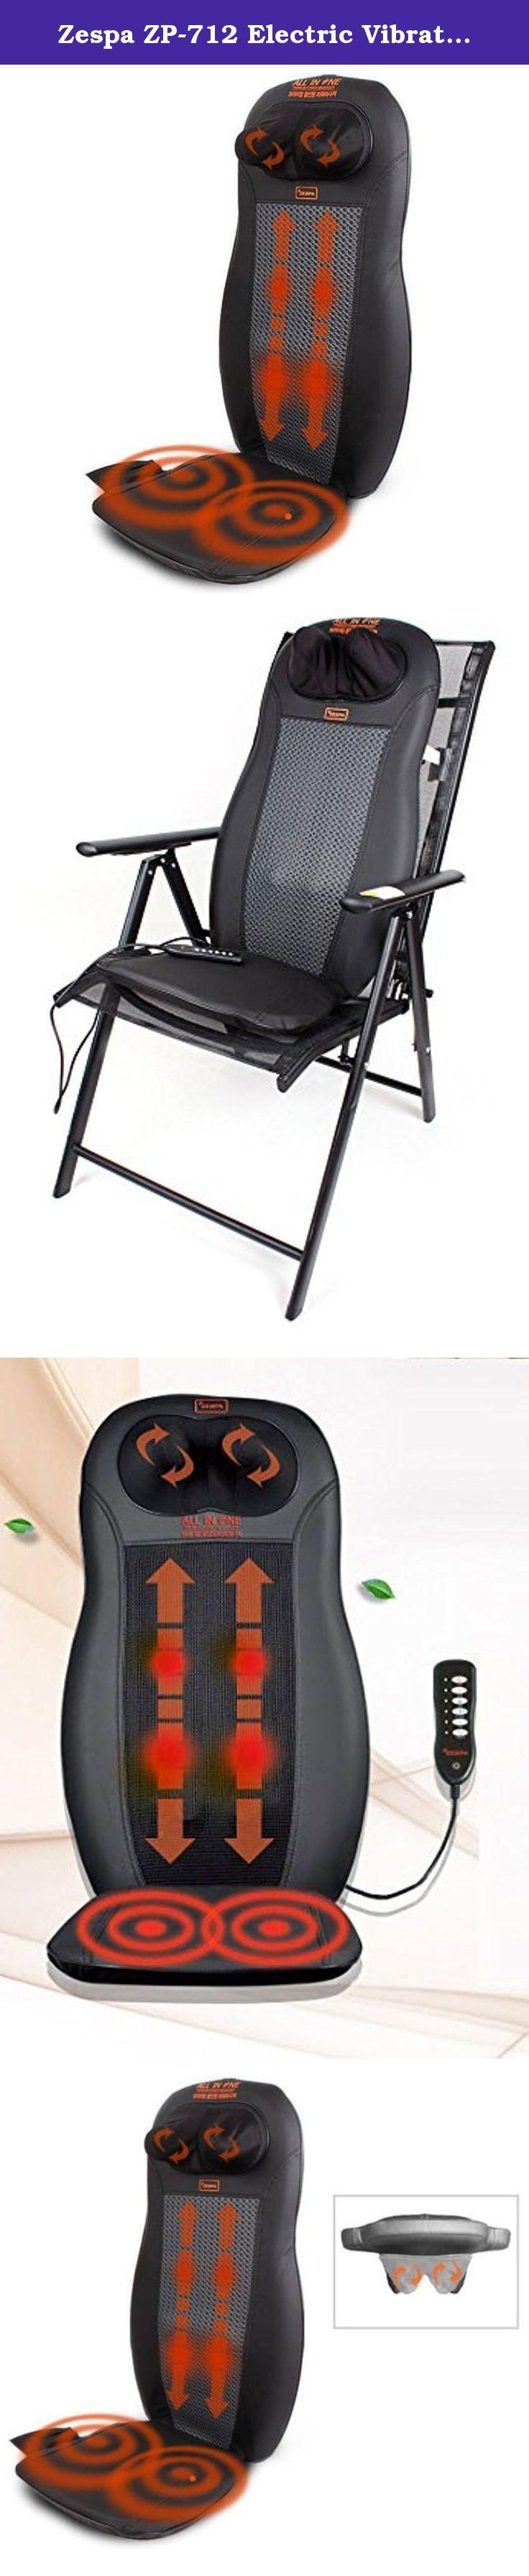 Zespa ZP712 Electric Vibrating Nect Back Massage Cushion